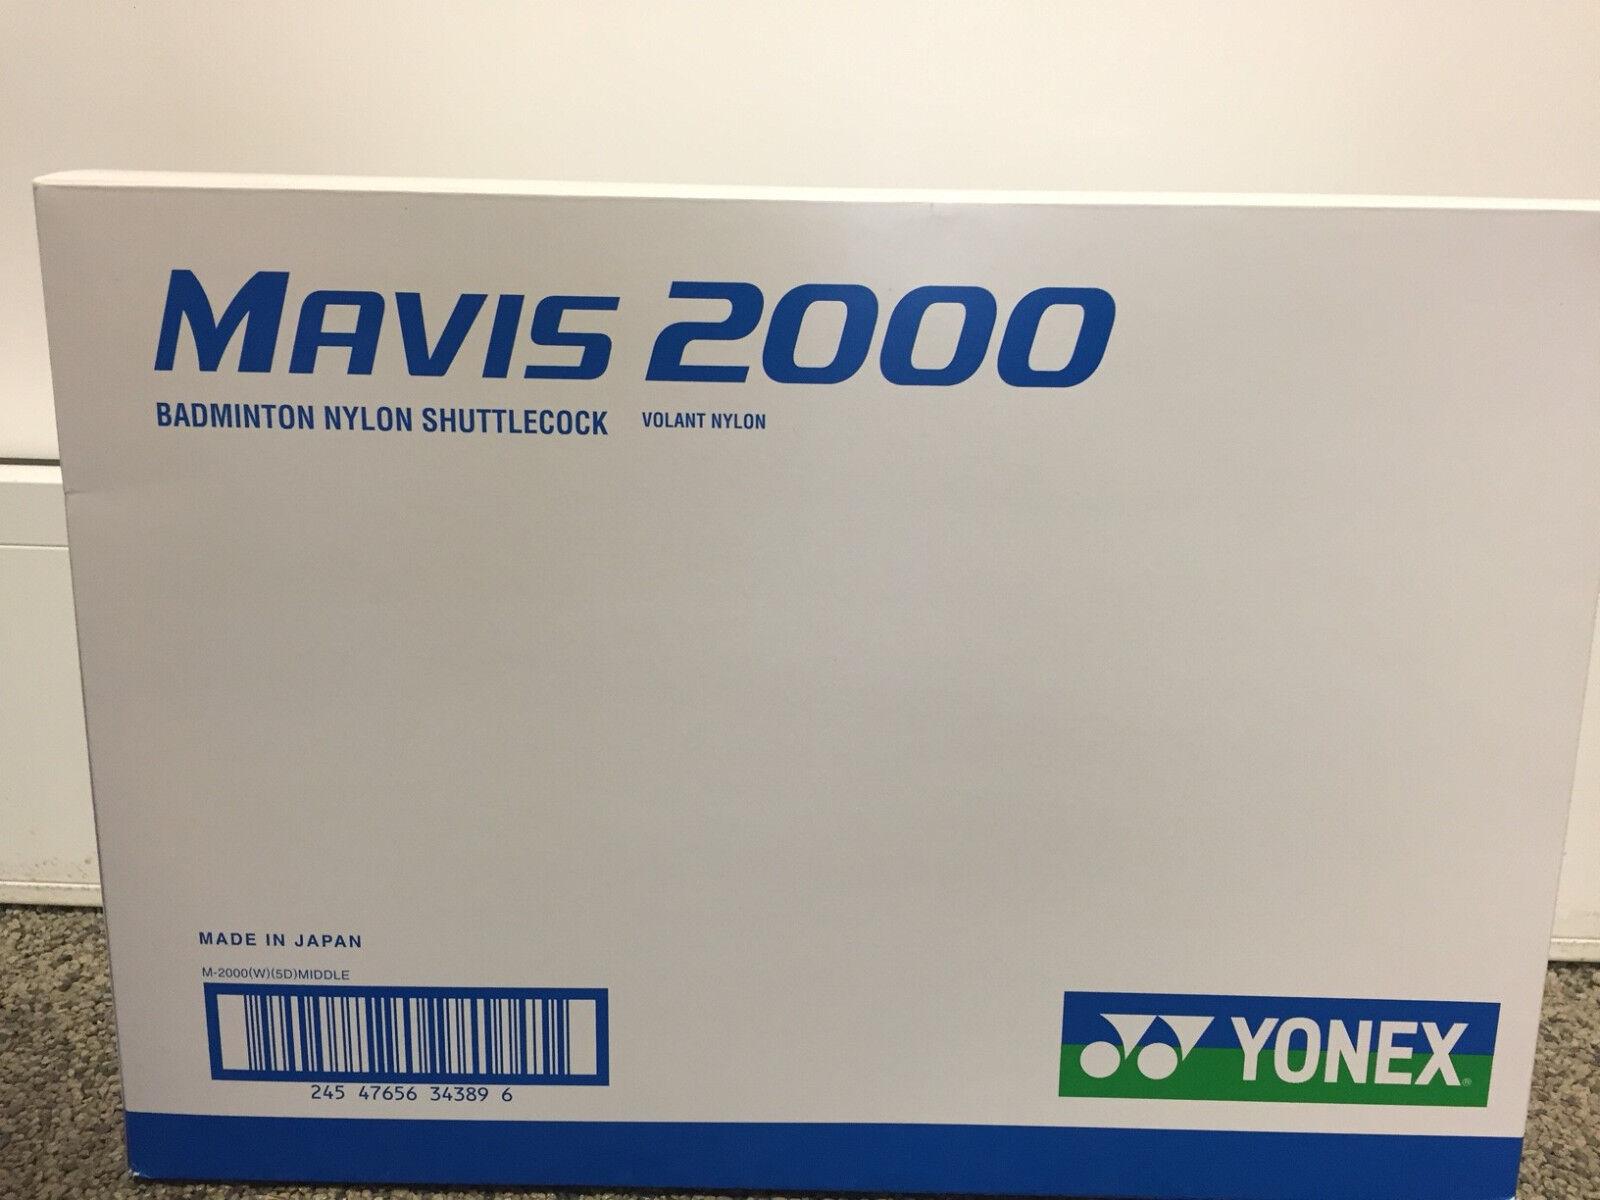 Yonex Mavis 2000 Nylon Plastik Federball Badmintonball Farbe Farbe Farbe weiß blau -NEU- 764ce7